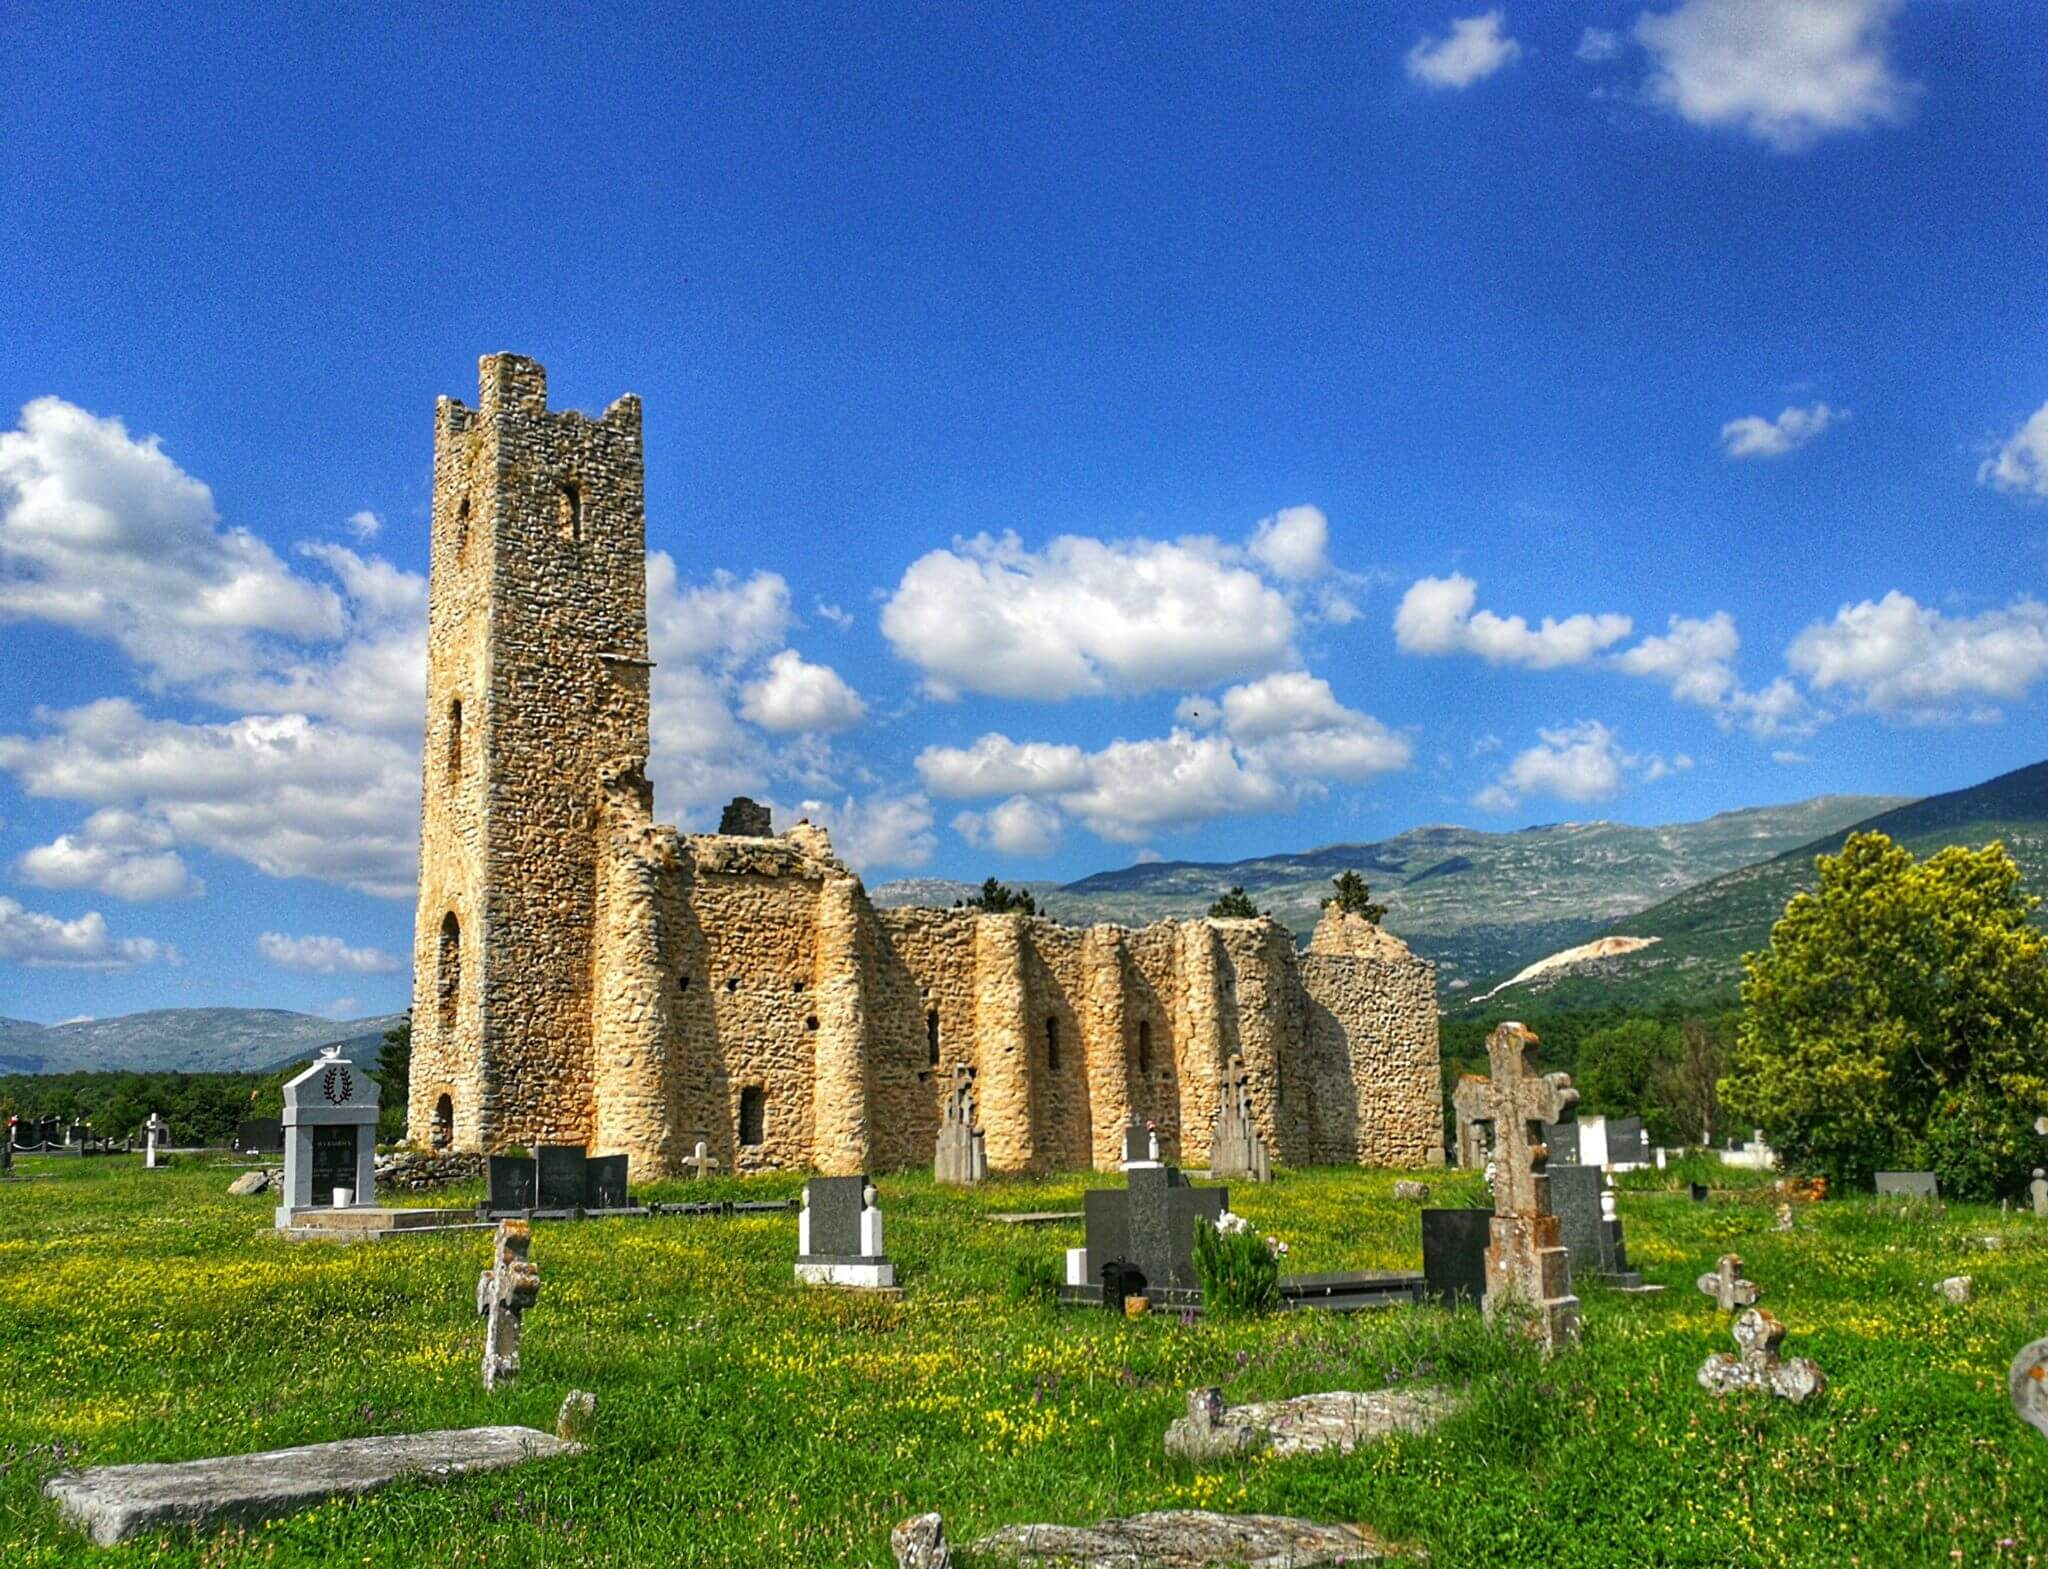 crkva sv. spasa à cetina